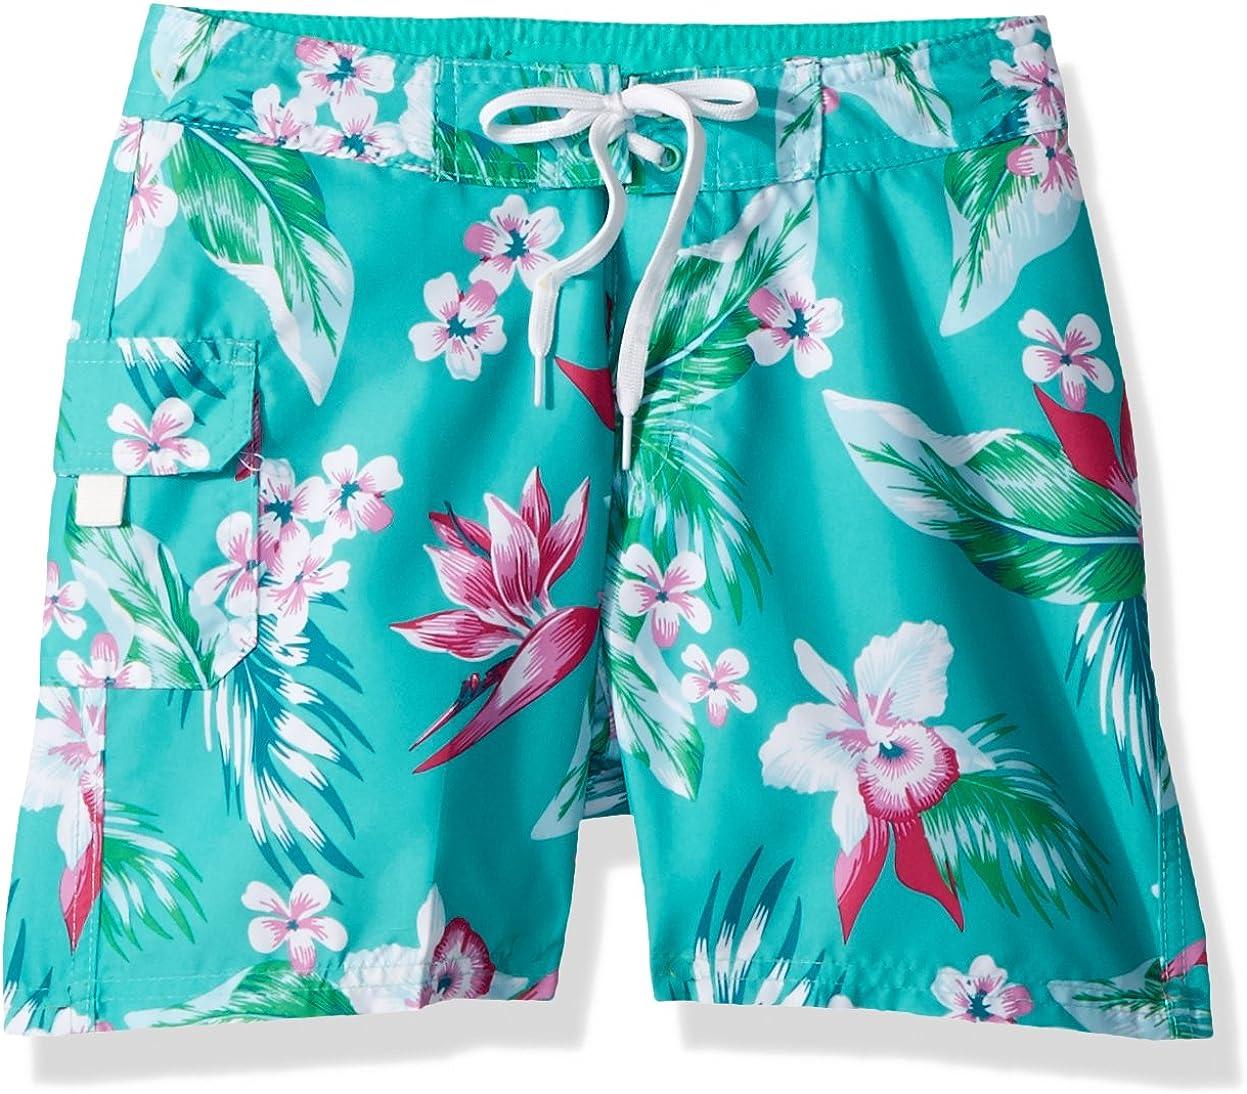 Kanu Surf Girls Sassy UPF 50 Quick Dry Beach Coverup Boardshort Board Shorts